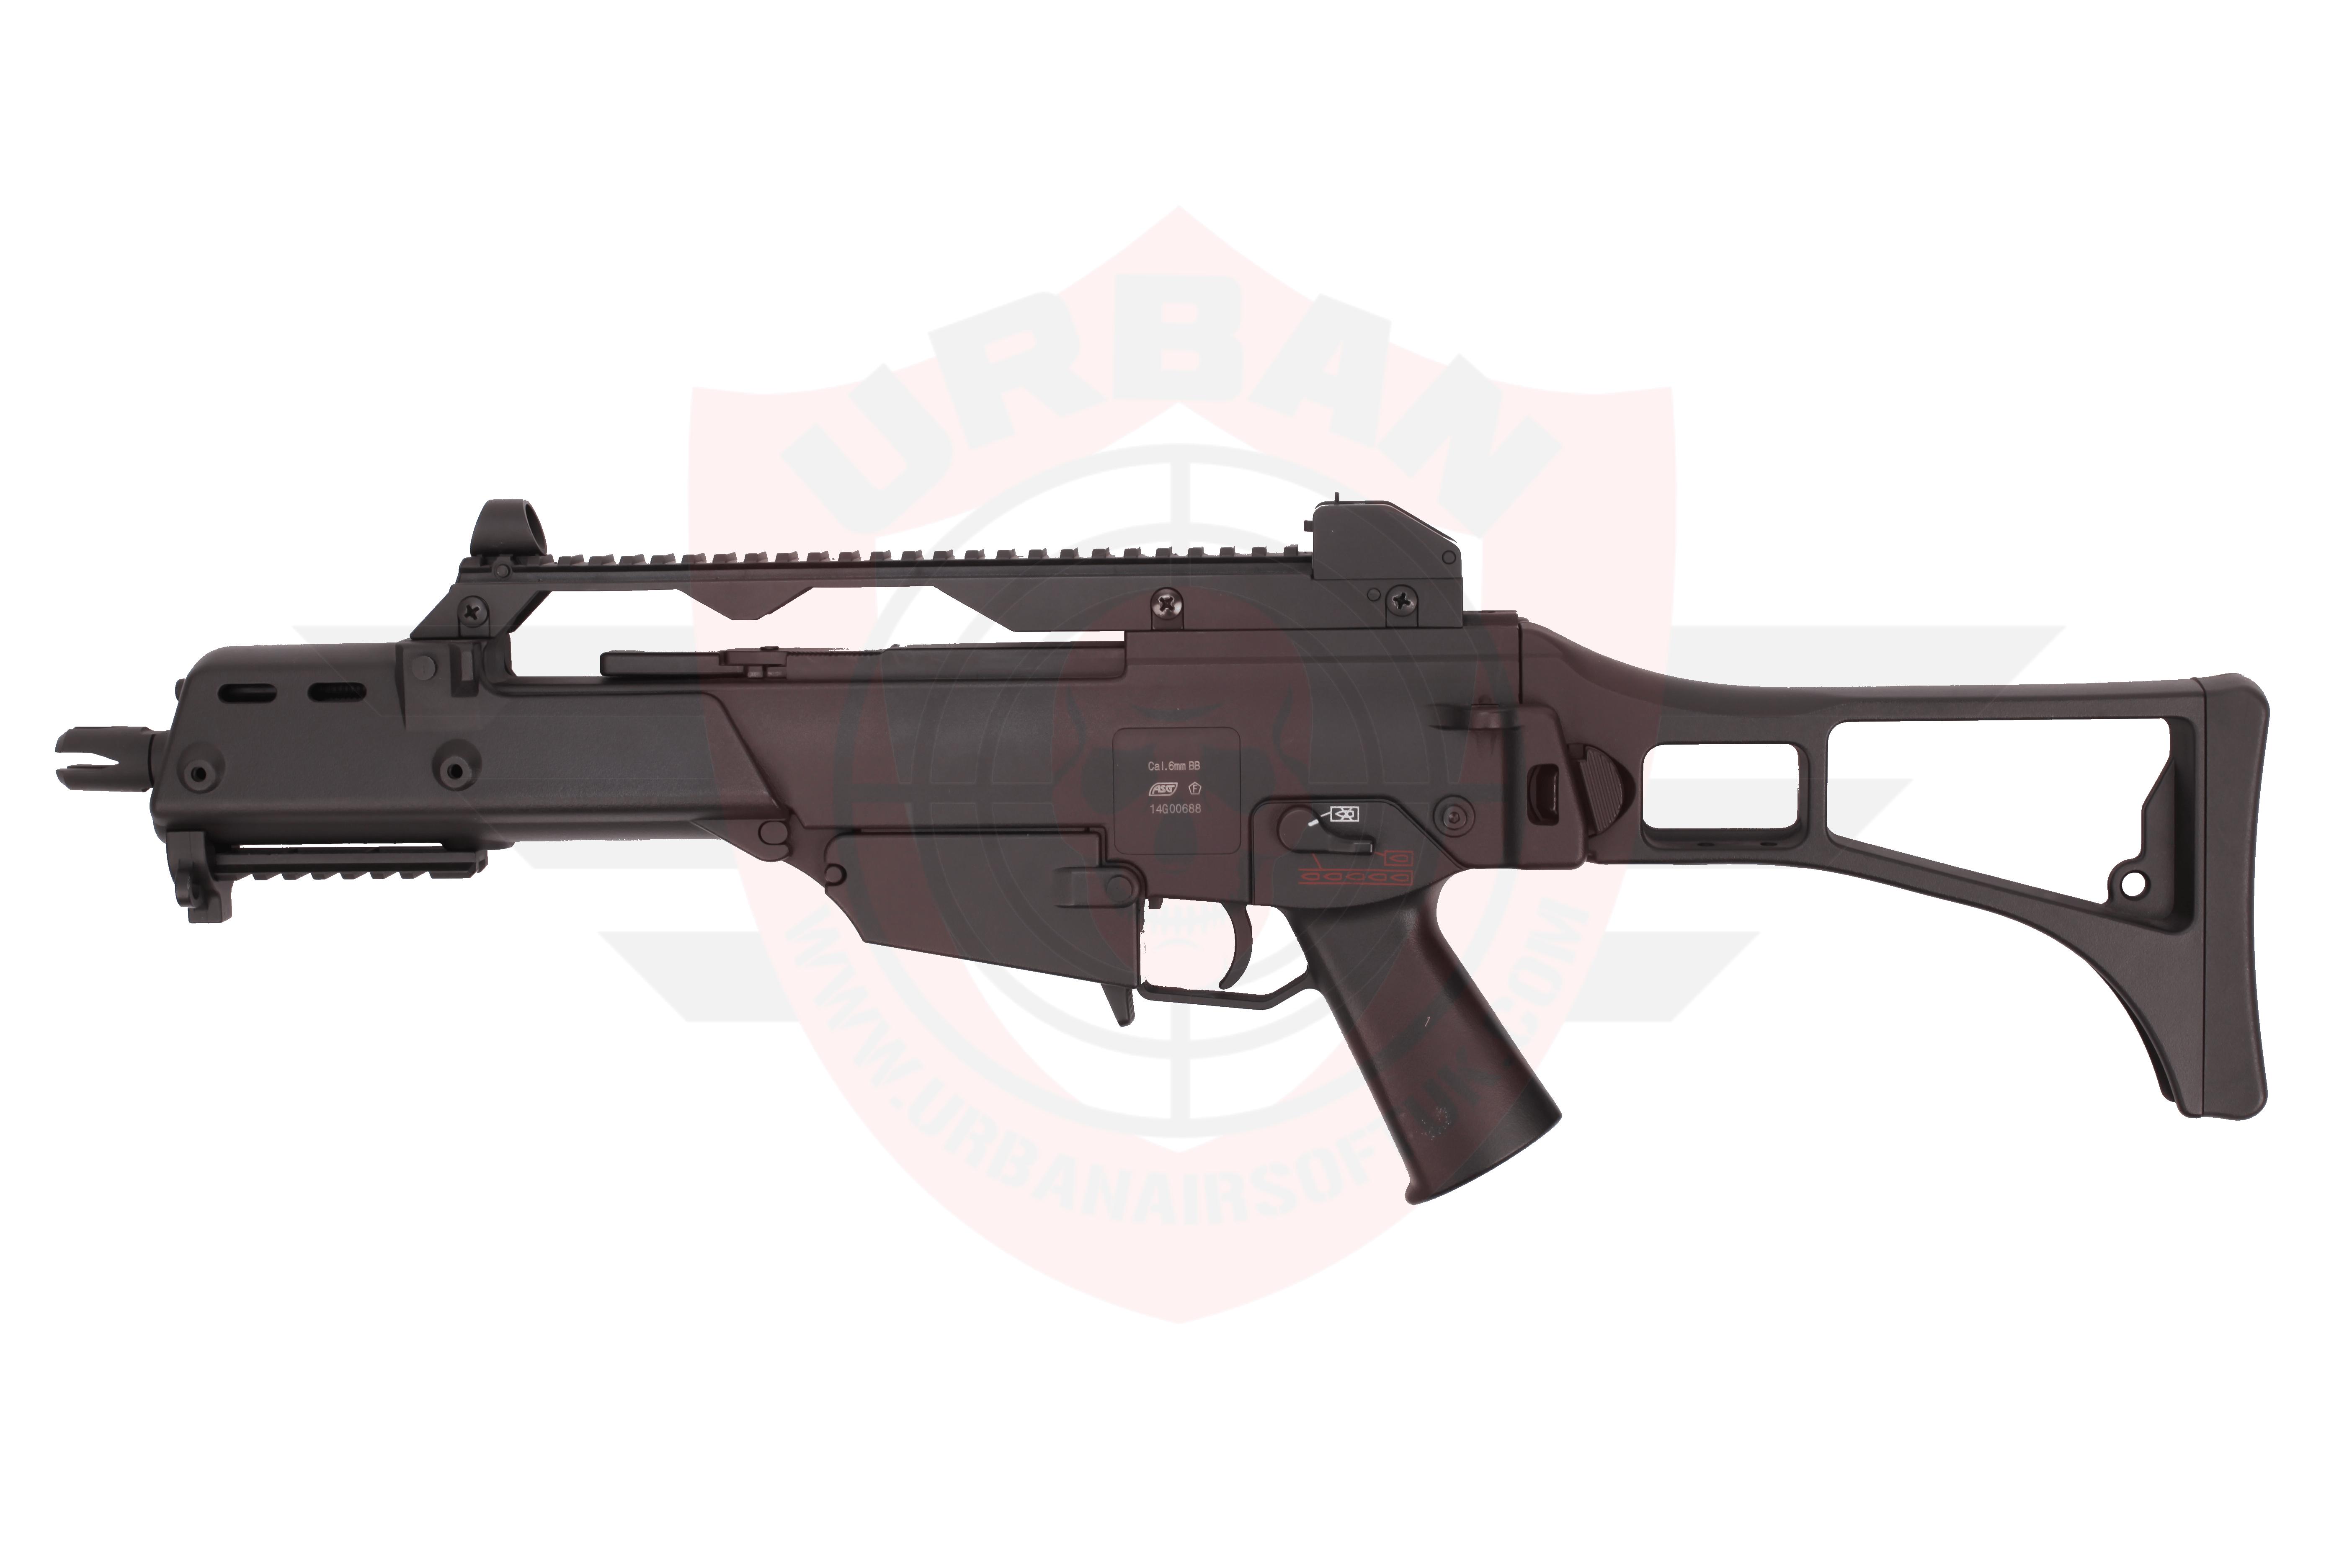 ASG SLV36 (G36) AEG Rifle product image